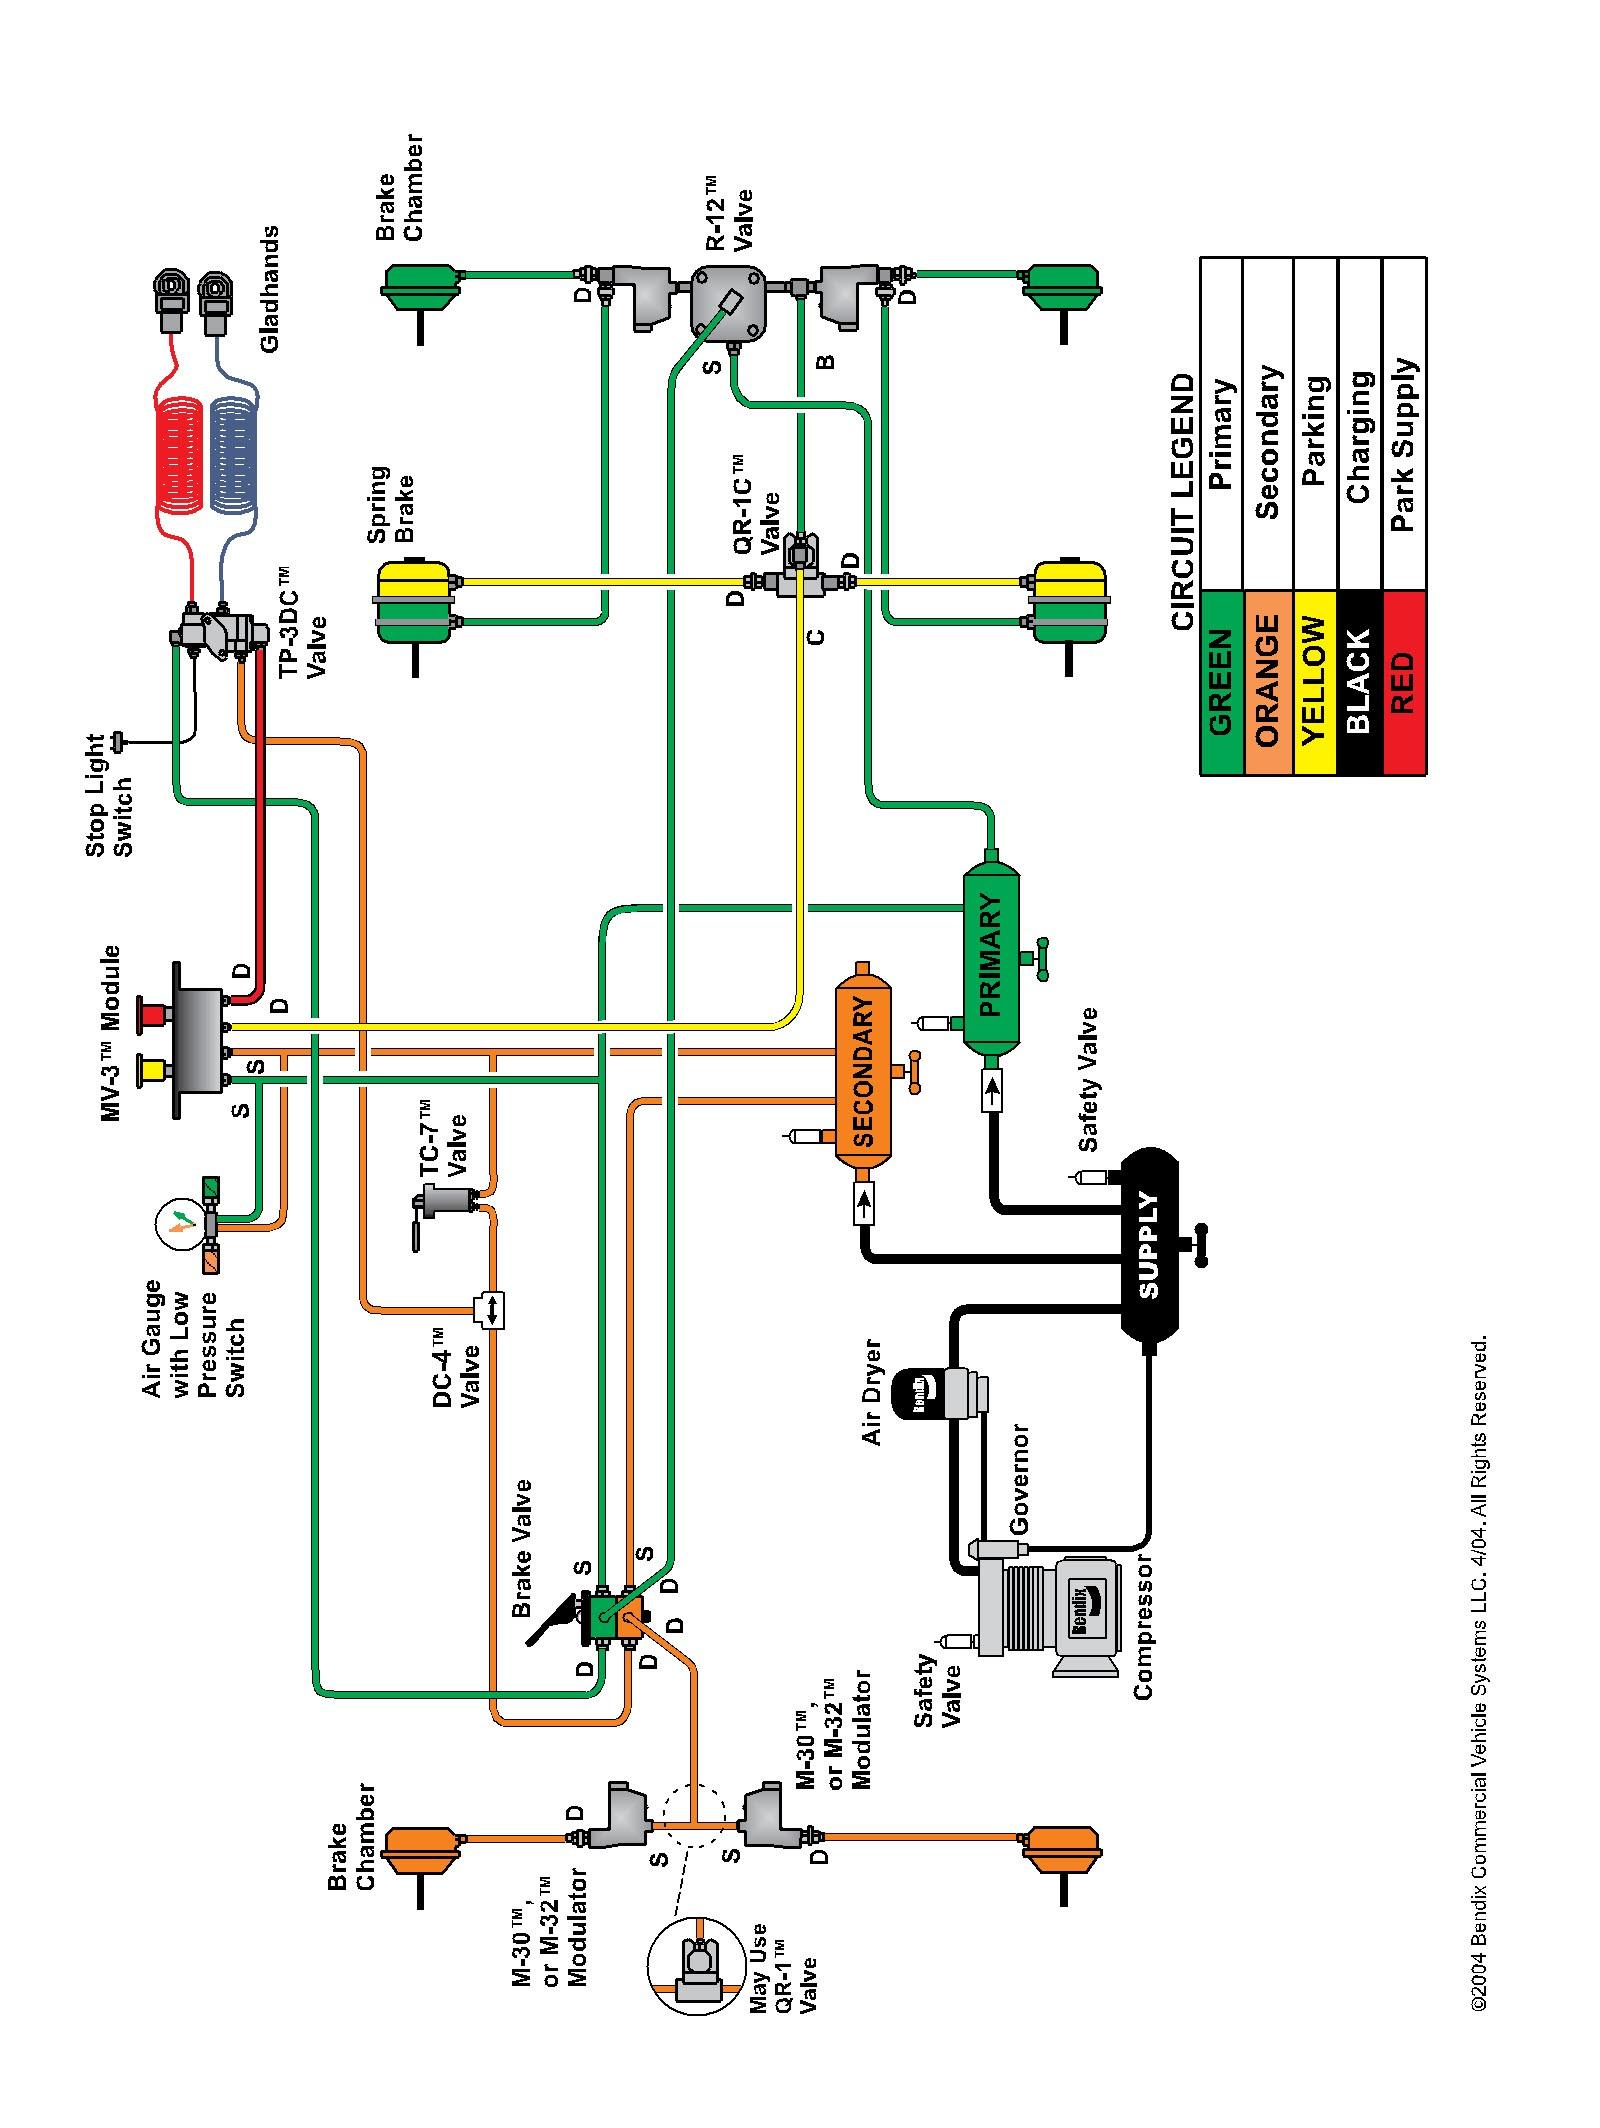 Air Brake System Diagram Travel Trailer Battery Hookup Wiring Management Unit Diagrams Besides Freightliner M2 Amu Of